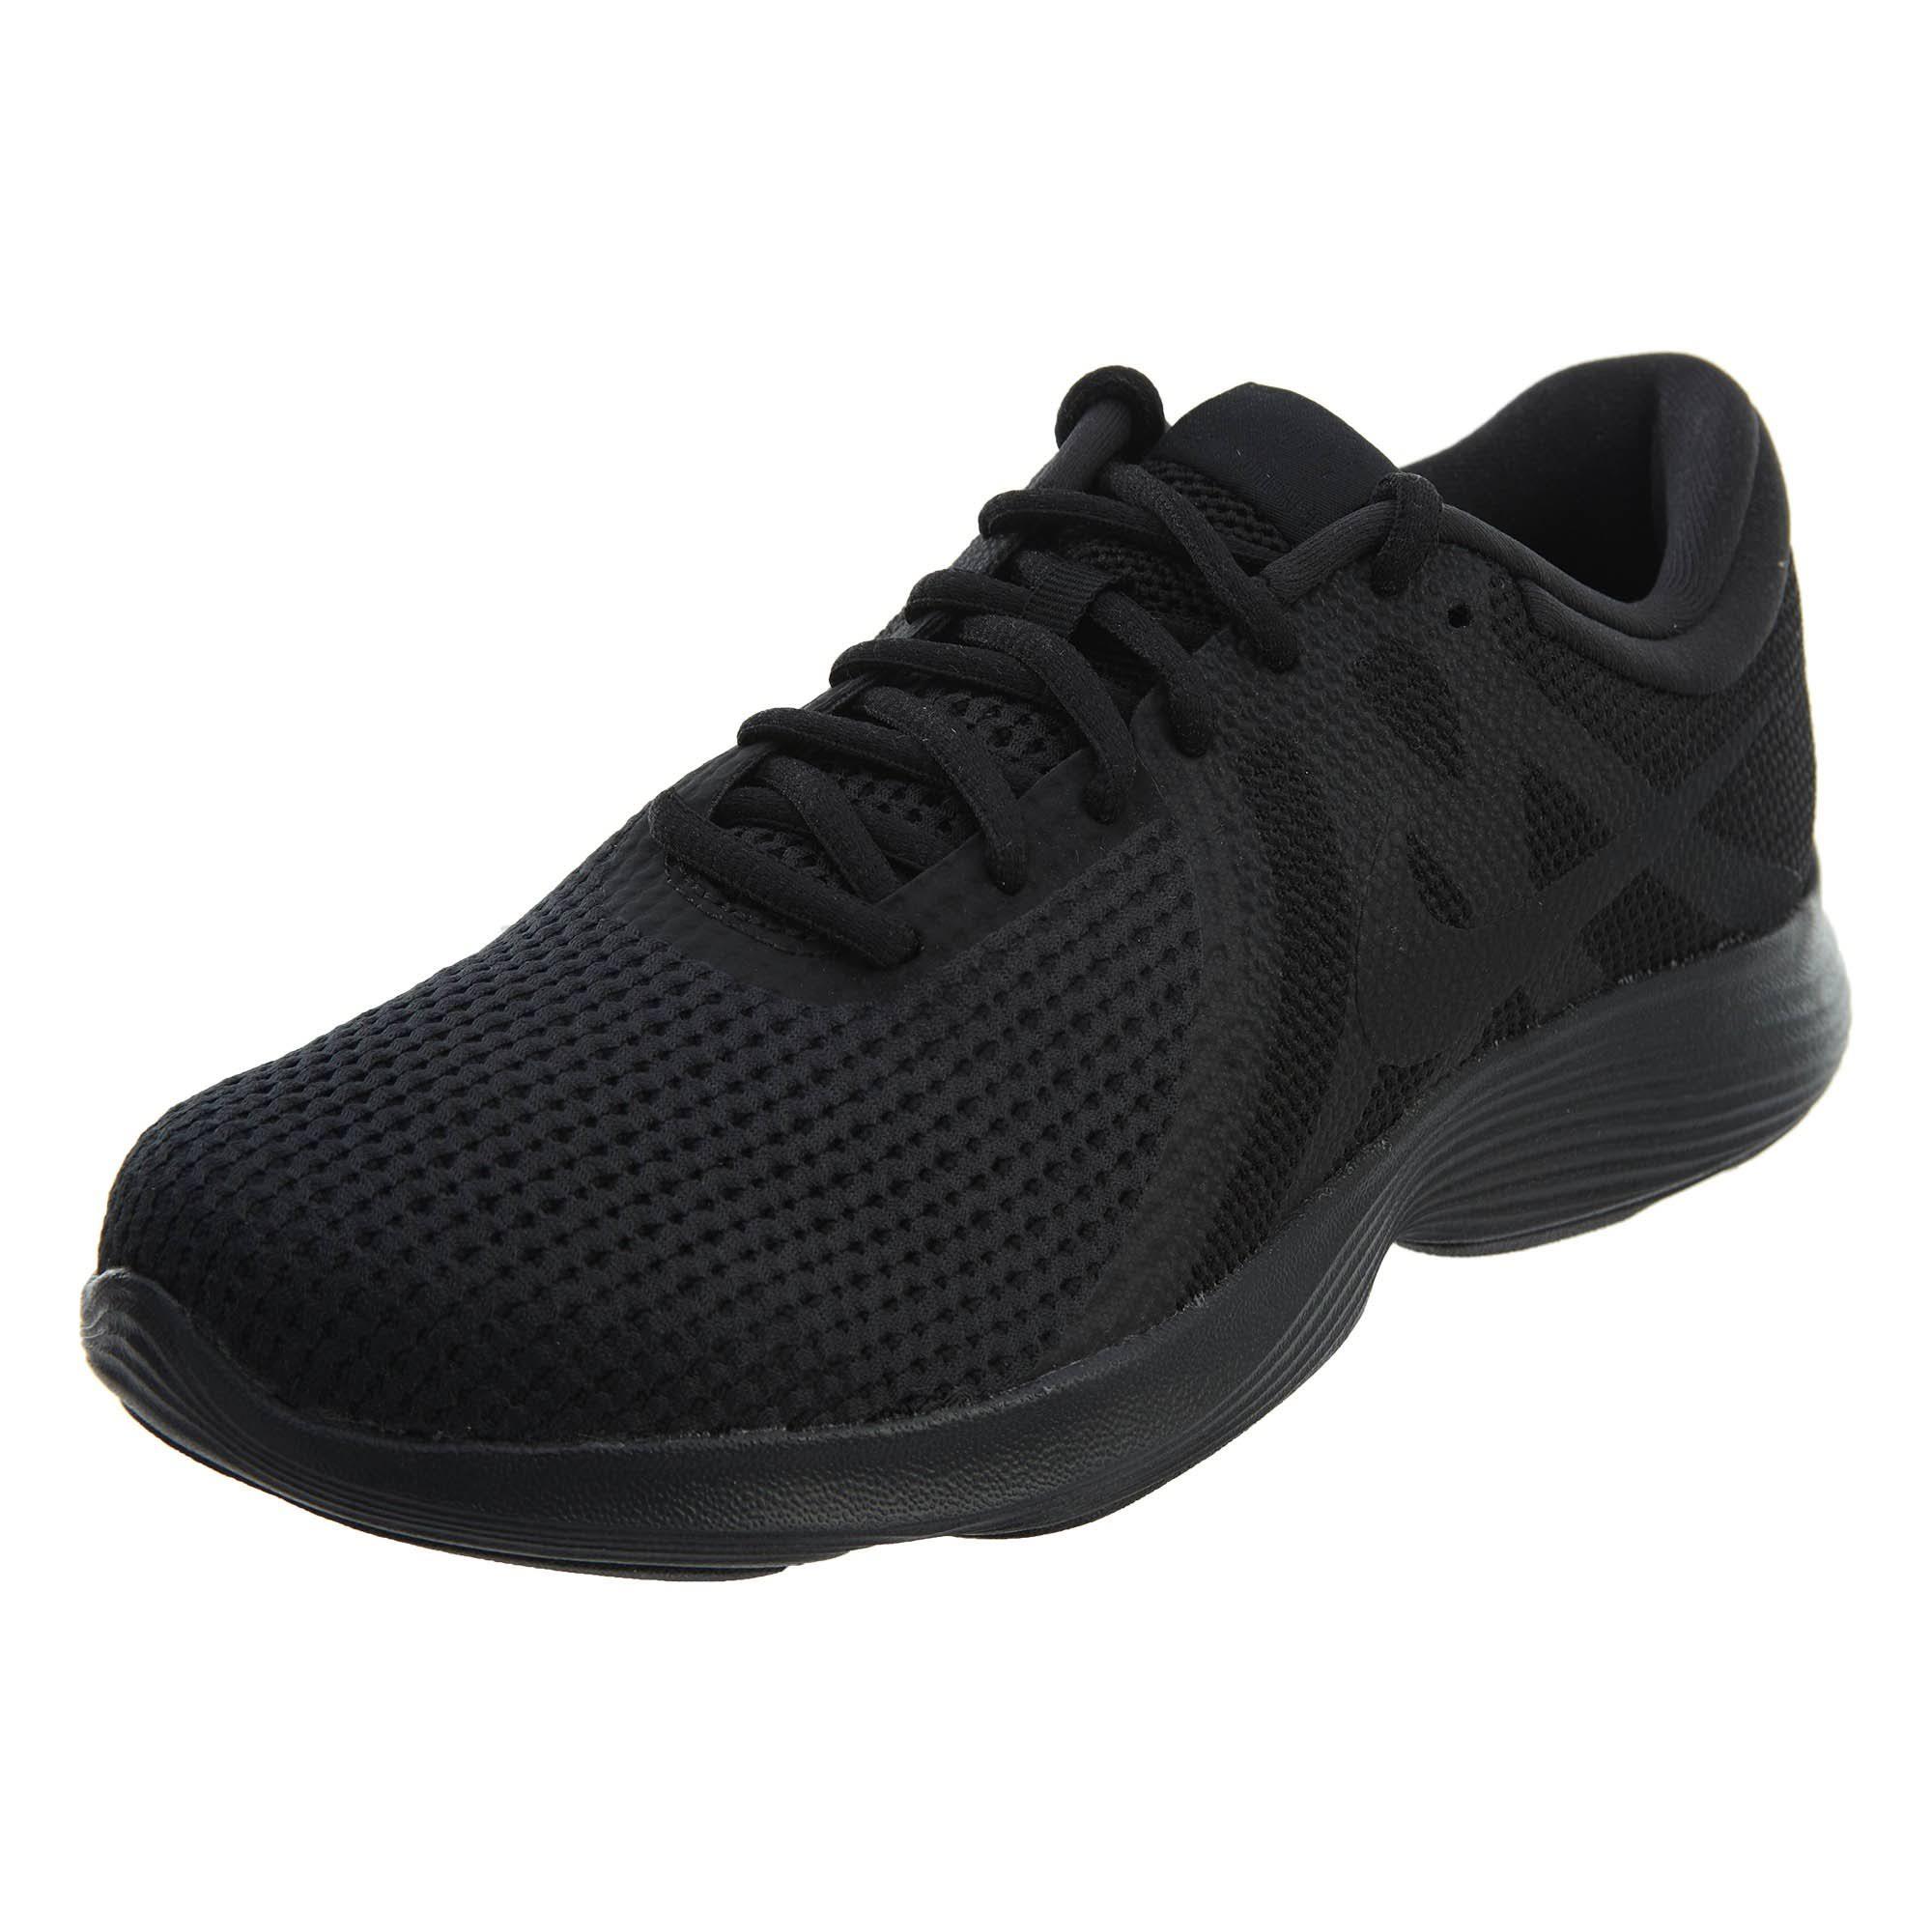 Schwarz 4 Revolution Men 4e Anthrazit Aa7402 Nike Sneakers Us 11 002 wtqEITxC